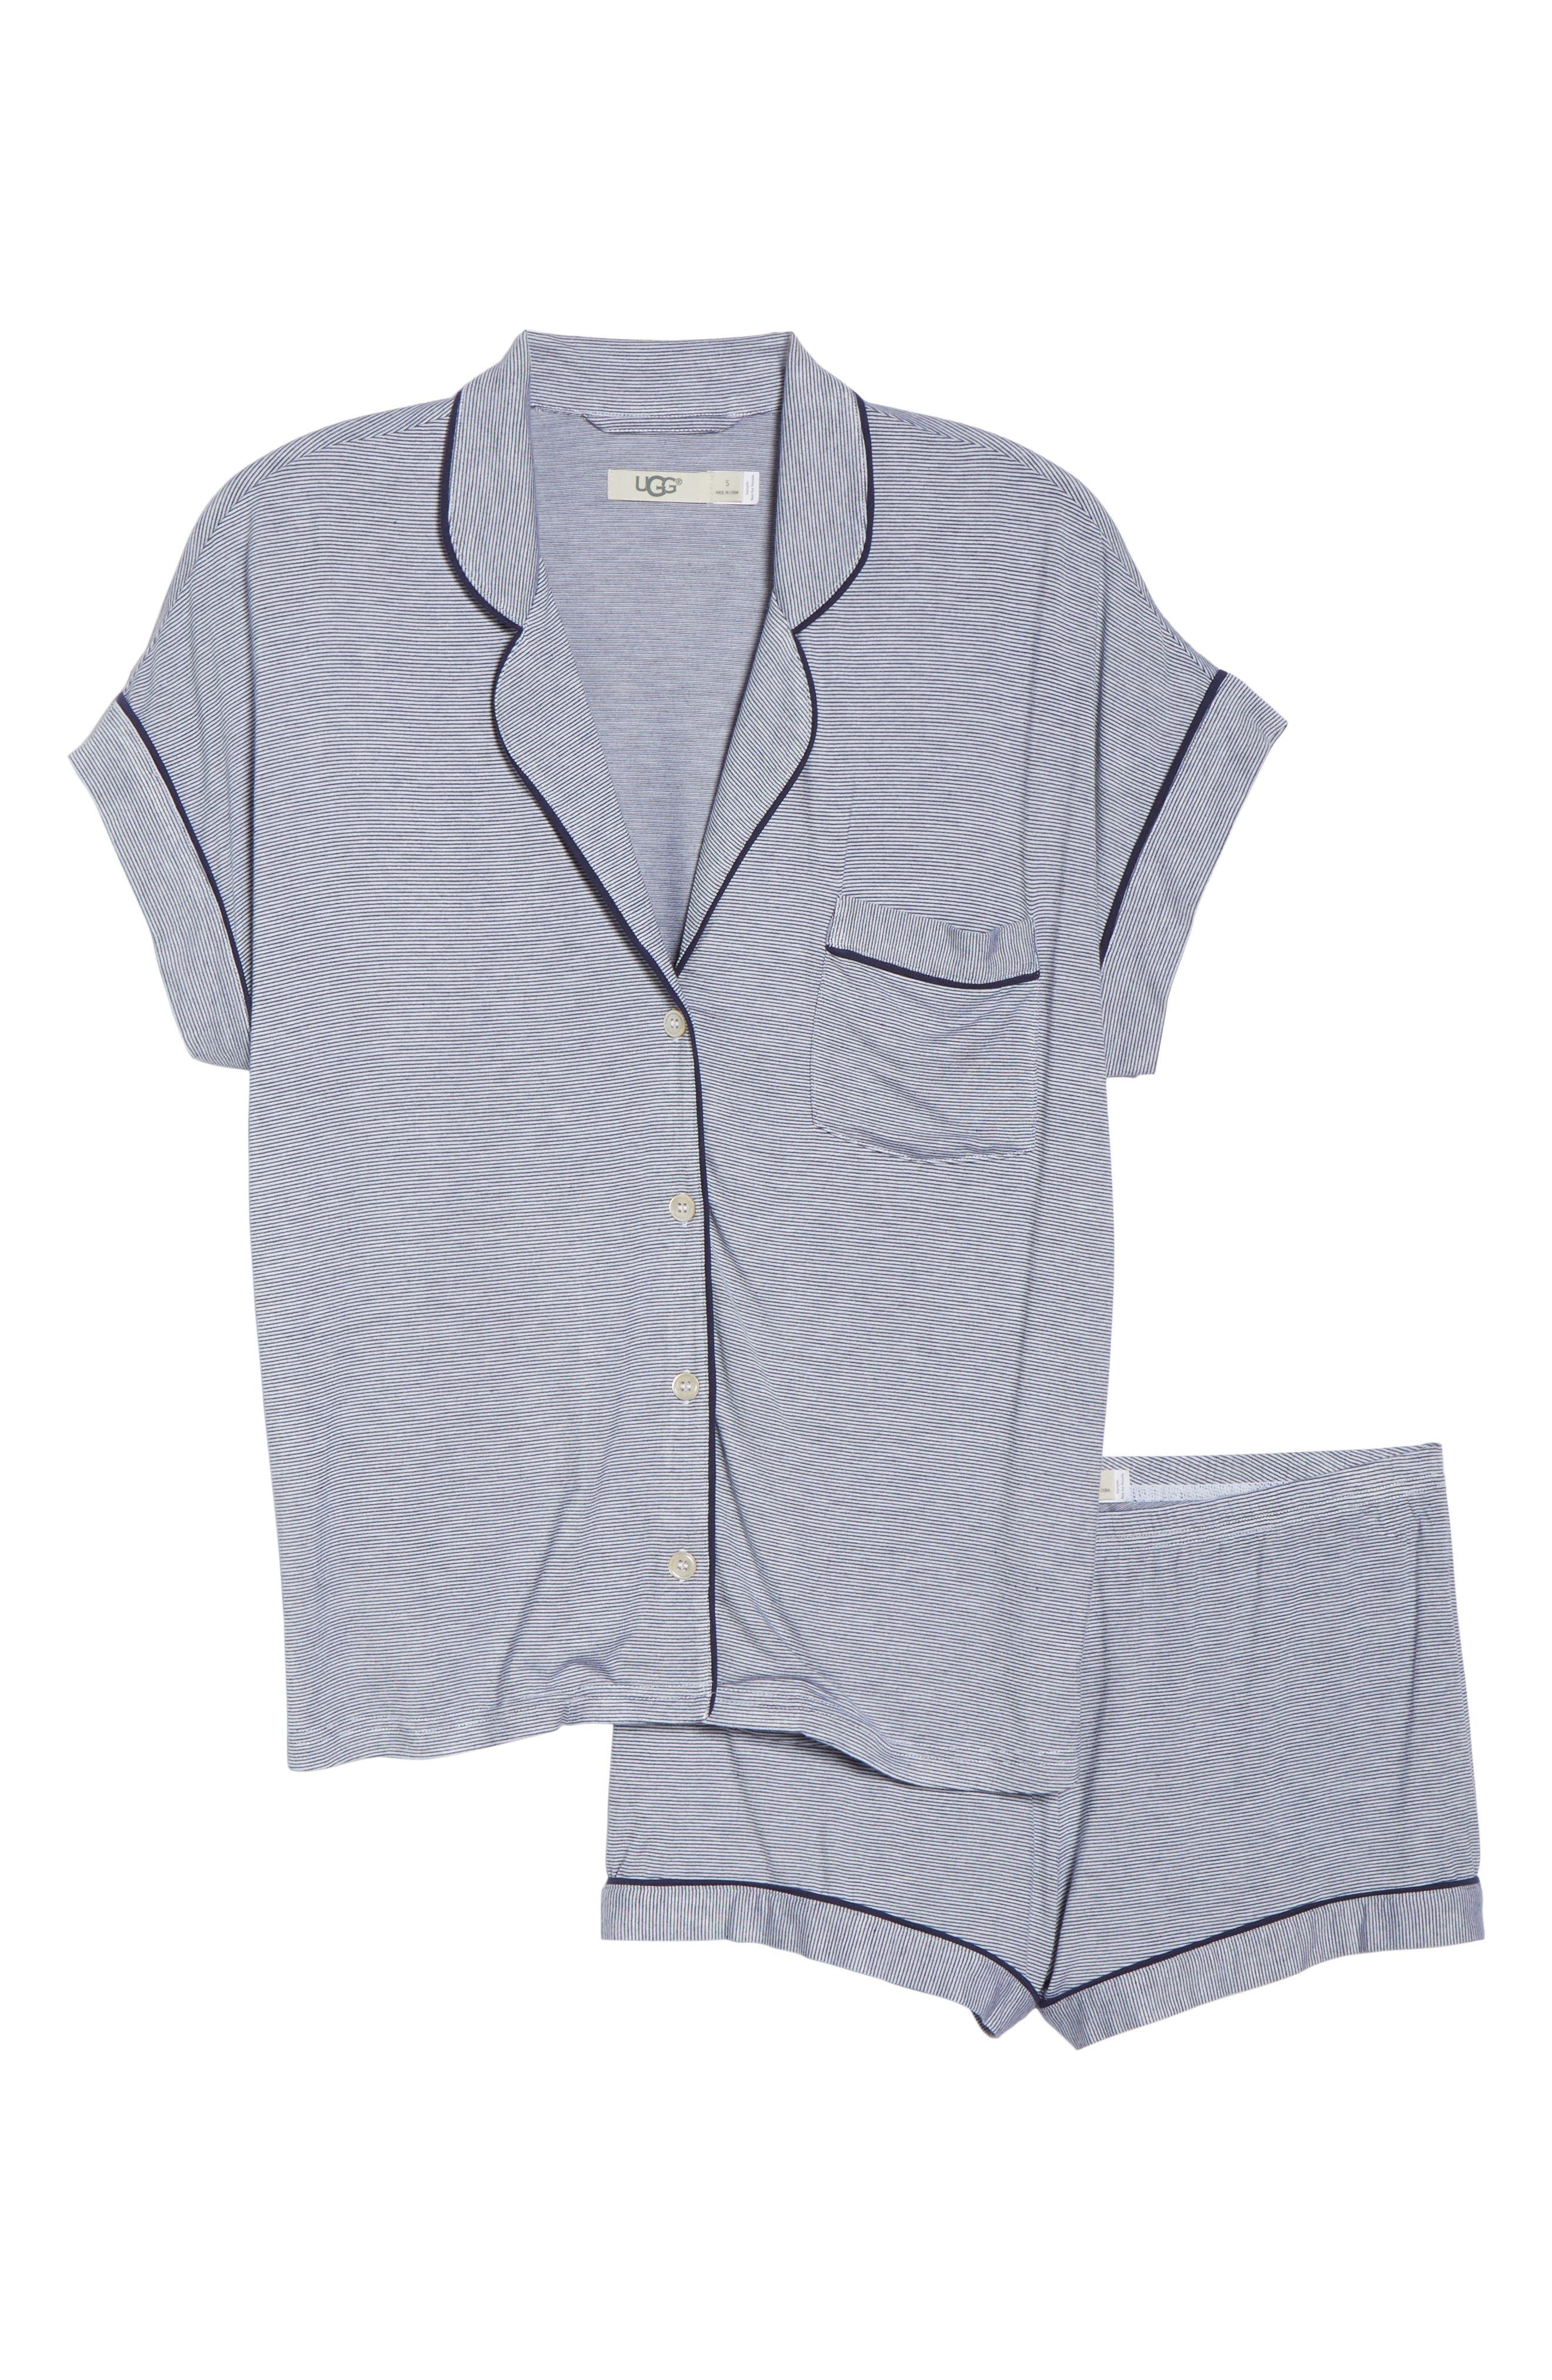 UGG<SUP>®</SUP>, Amelia Short Pajamas, Alternate thumbnail 6, color, 411